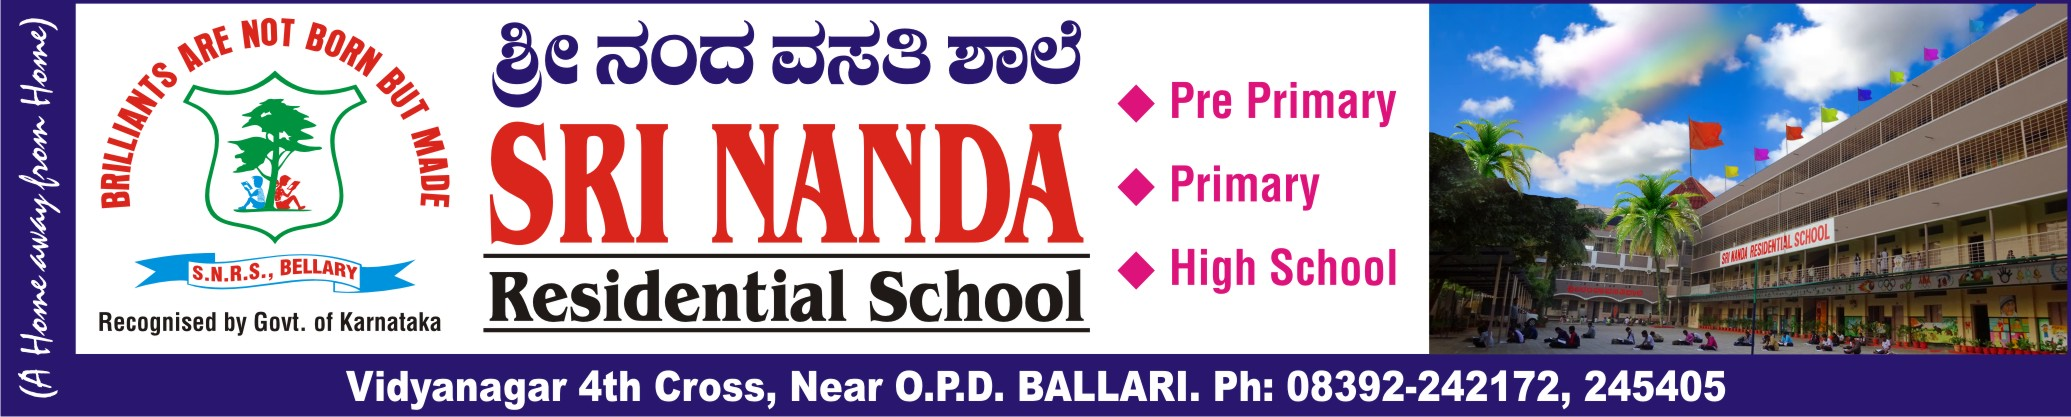 Sri Nanda Residential School